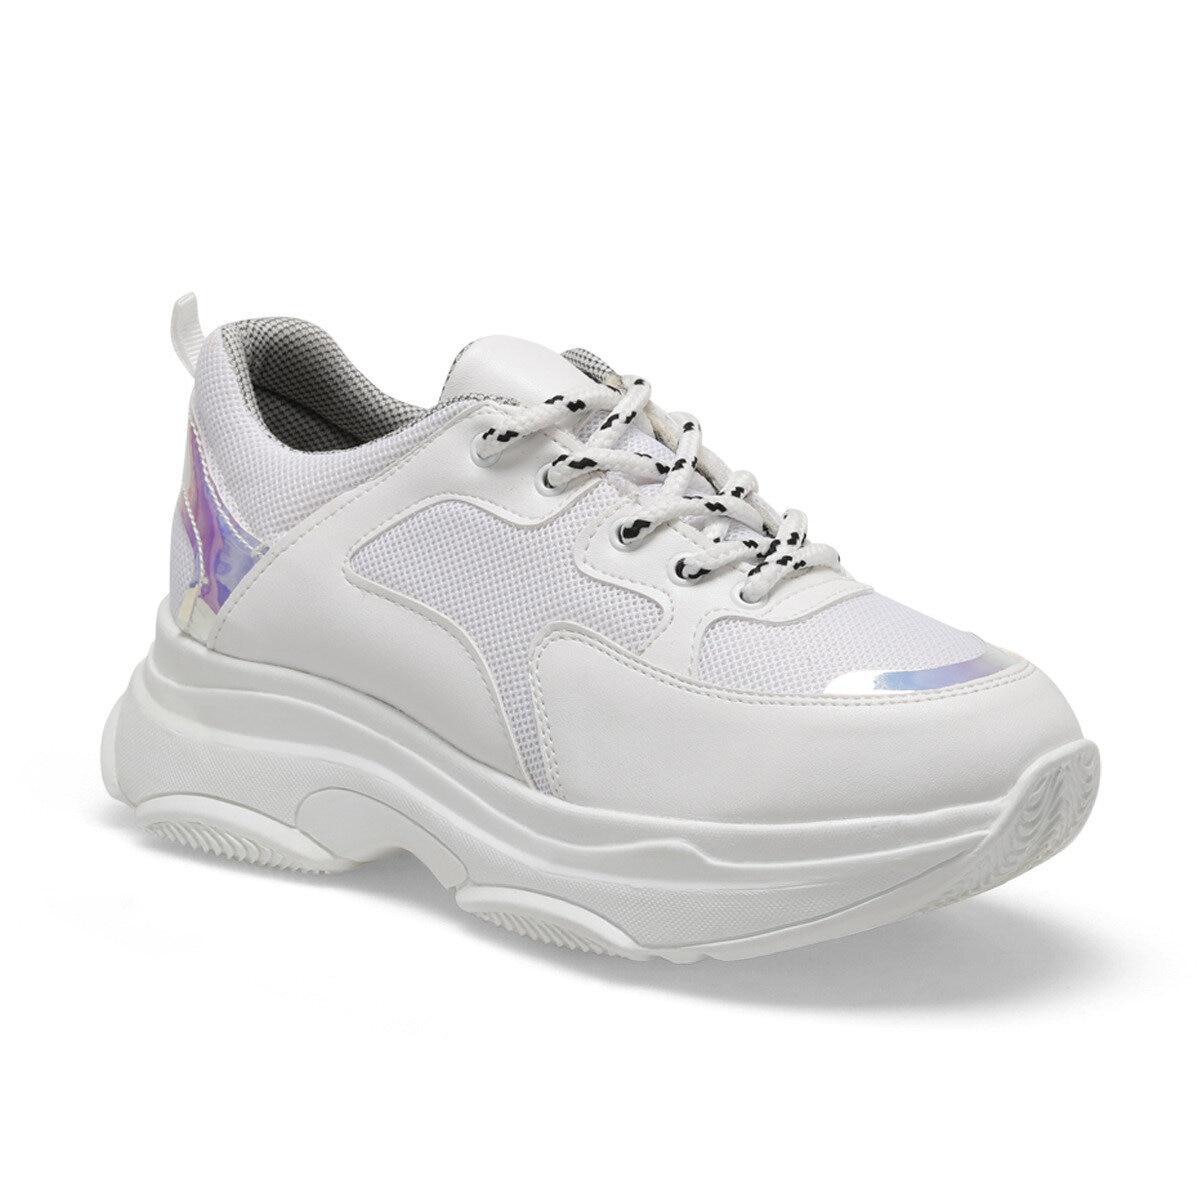 FLO 19SF-1501-19K White Women 'S Sneaker Shoes BUTIGO